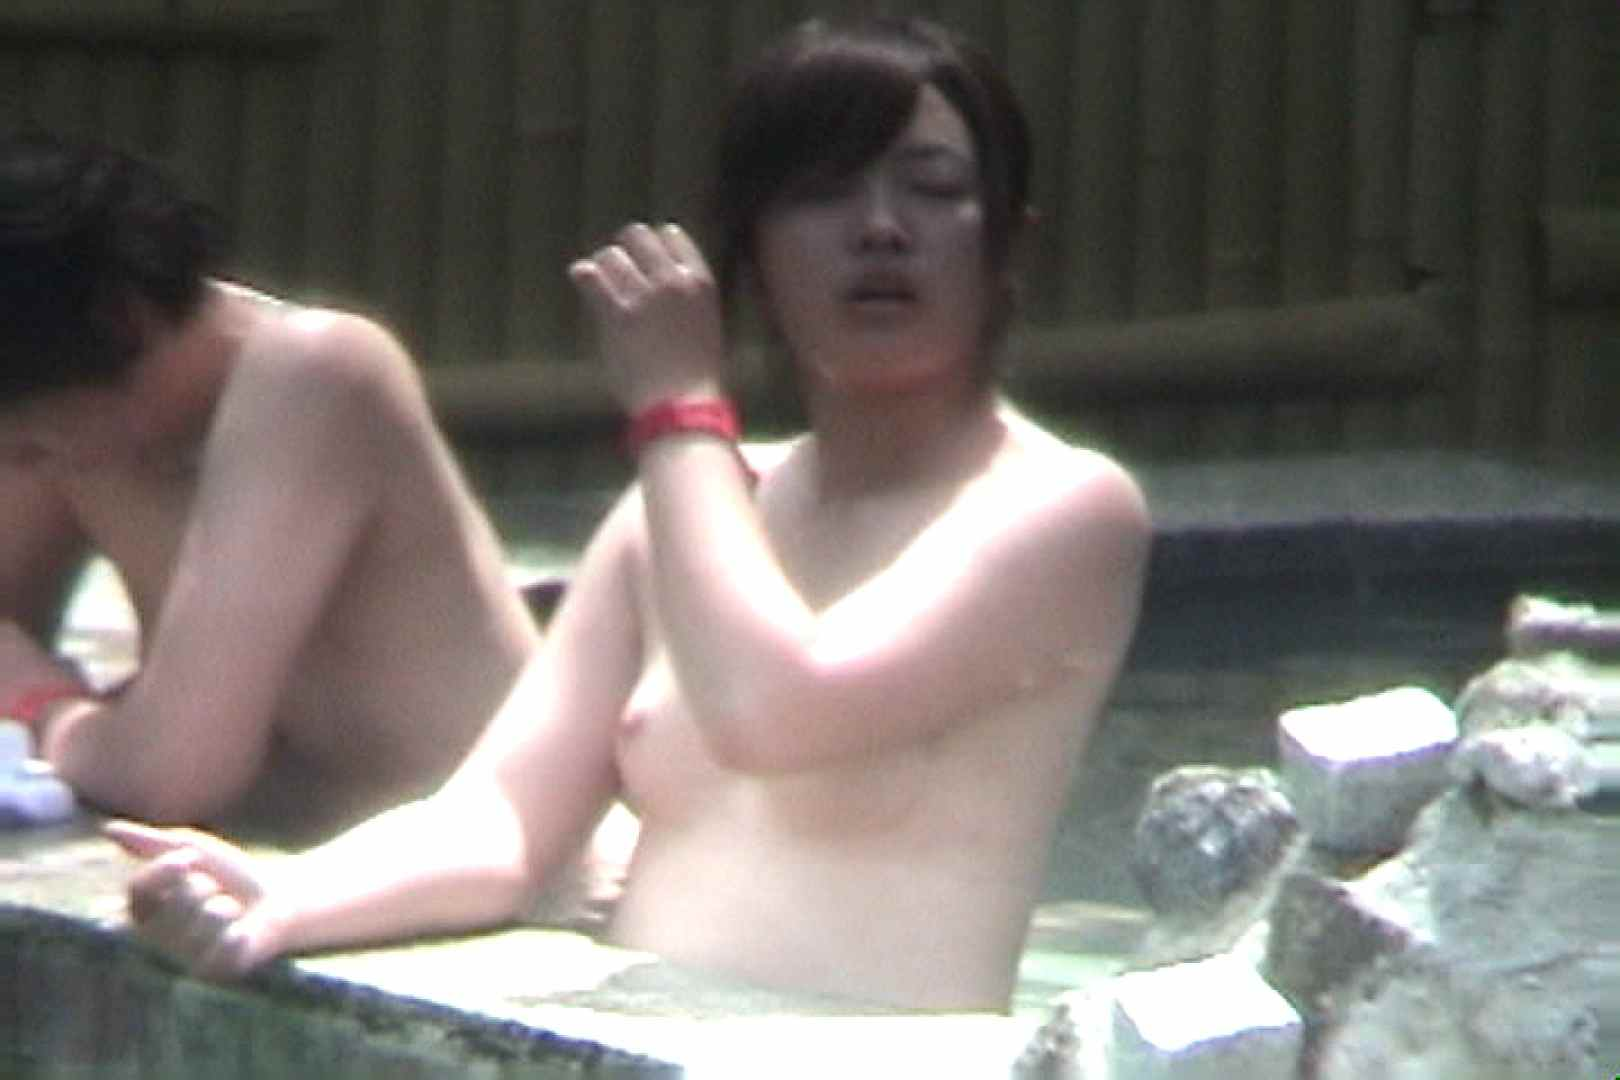 Aquaな露天風呂Vol.55【VIP限定】 露天風呂突入 | 美しいOLの裸体  103pic 88